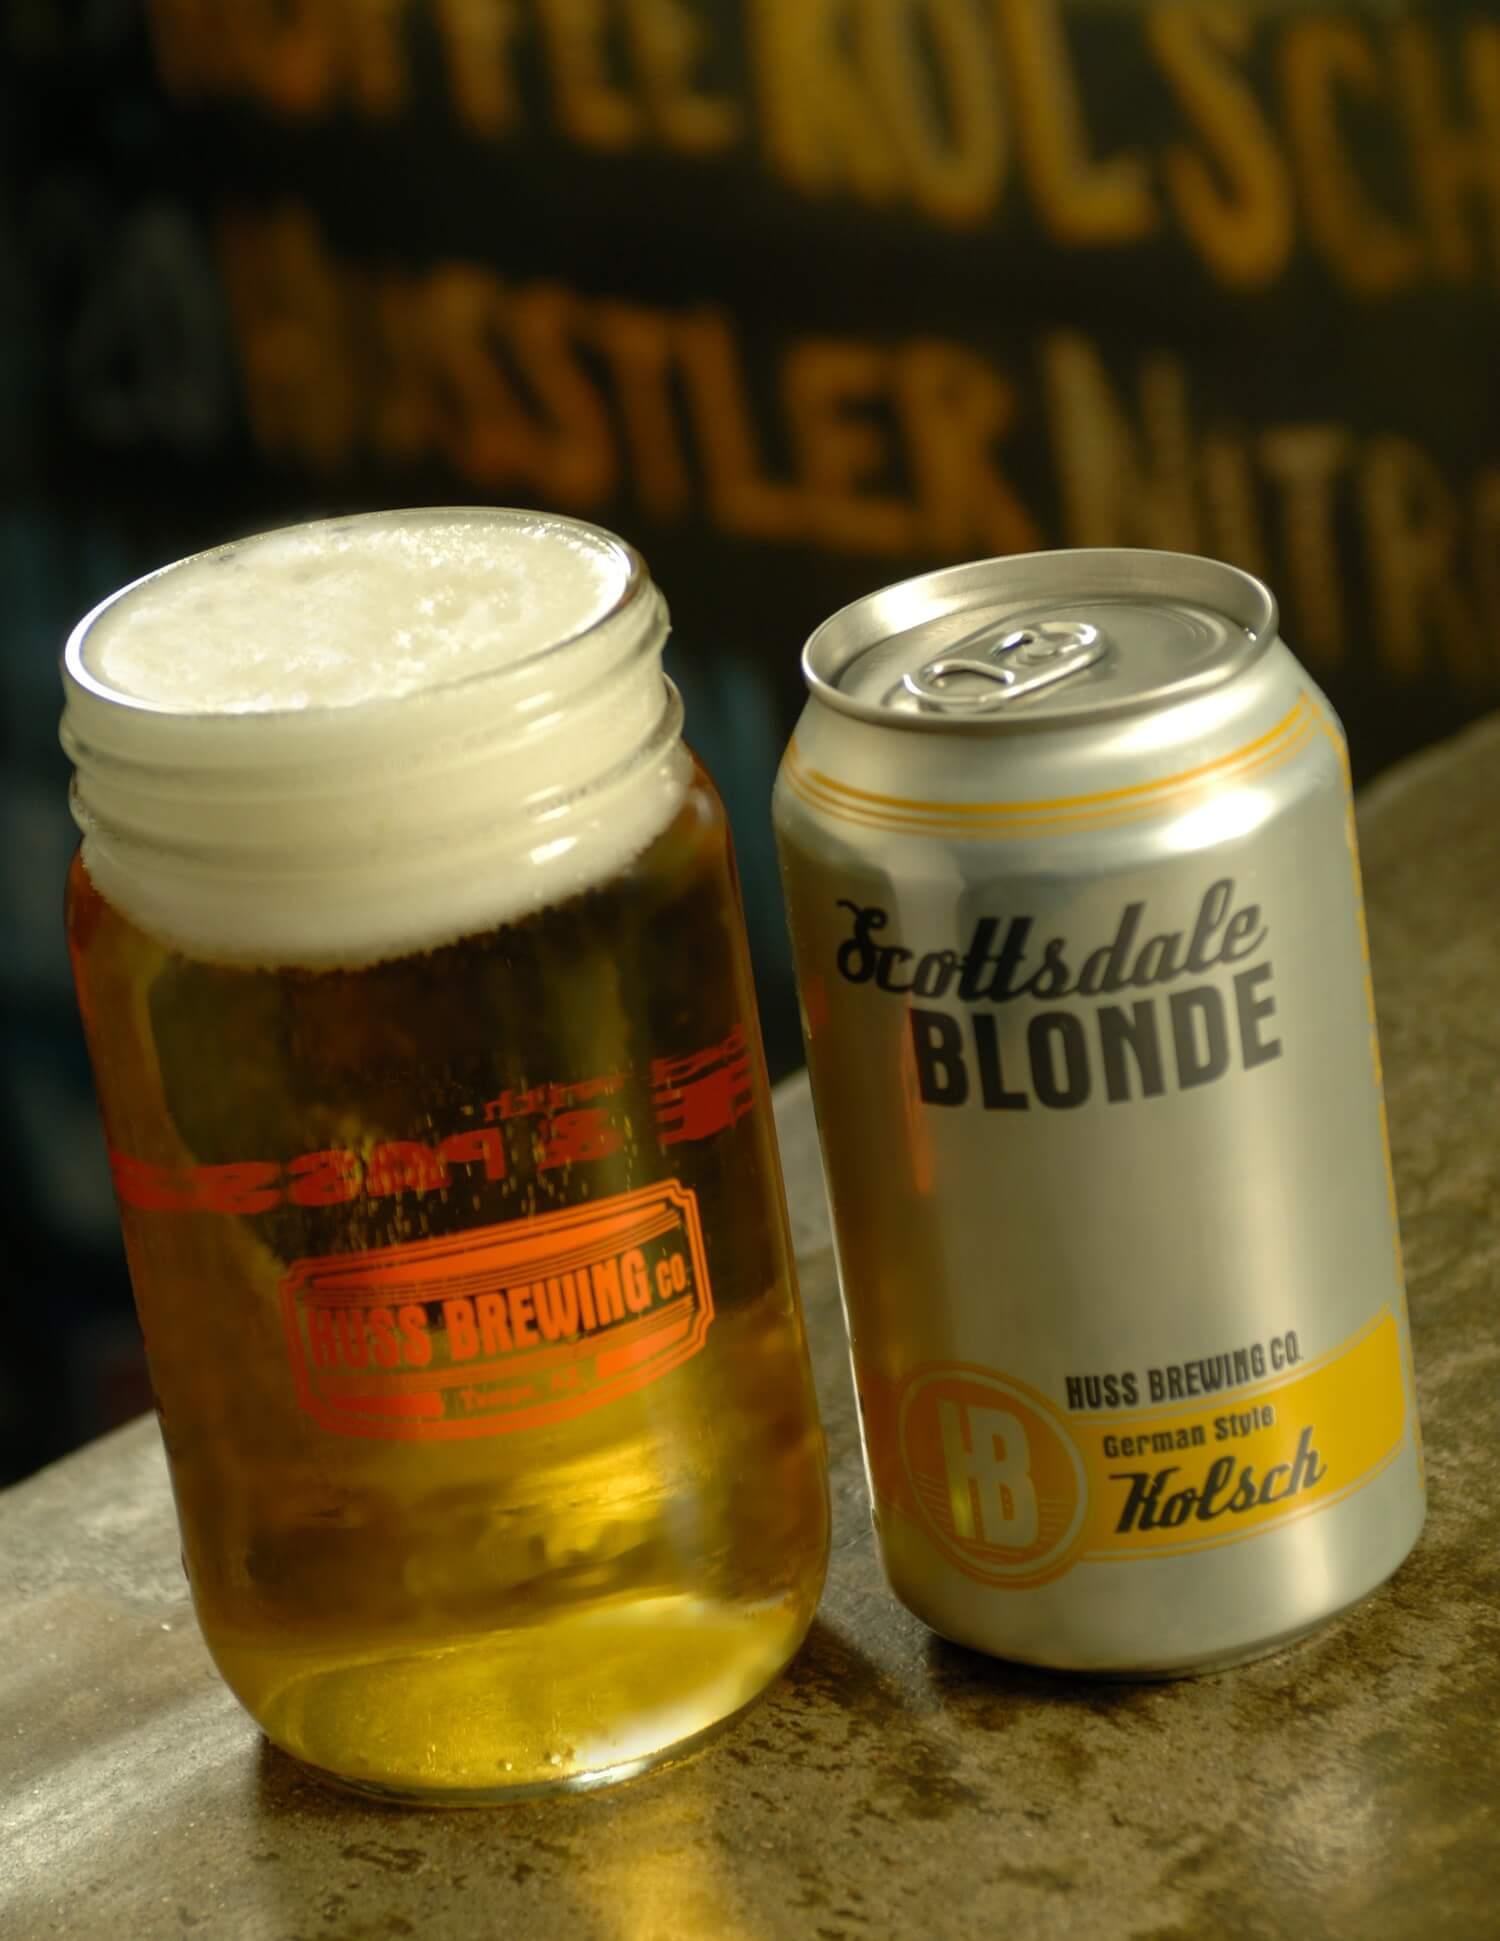 Huss Scottsdale Blonde 2